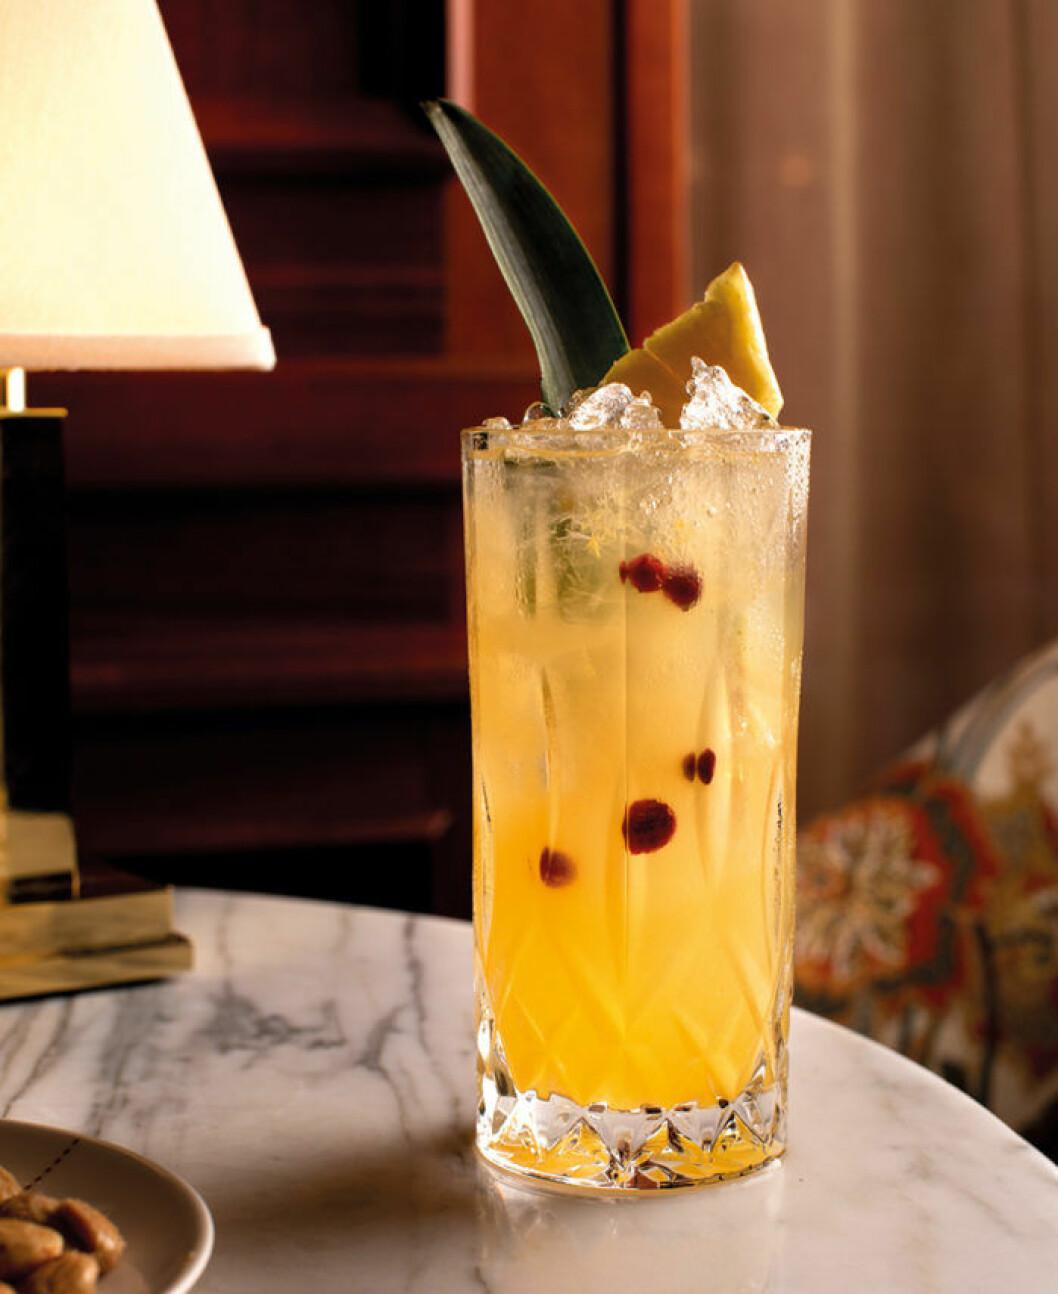 Den alkoholfria drinken Coast Line från Bank Hotel.